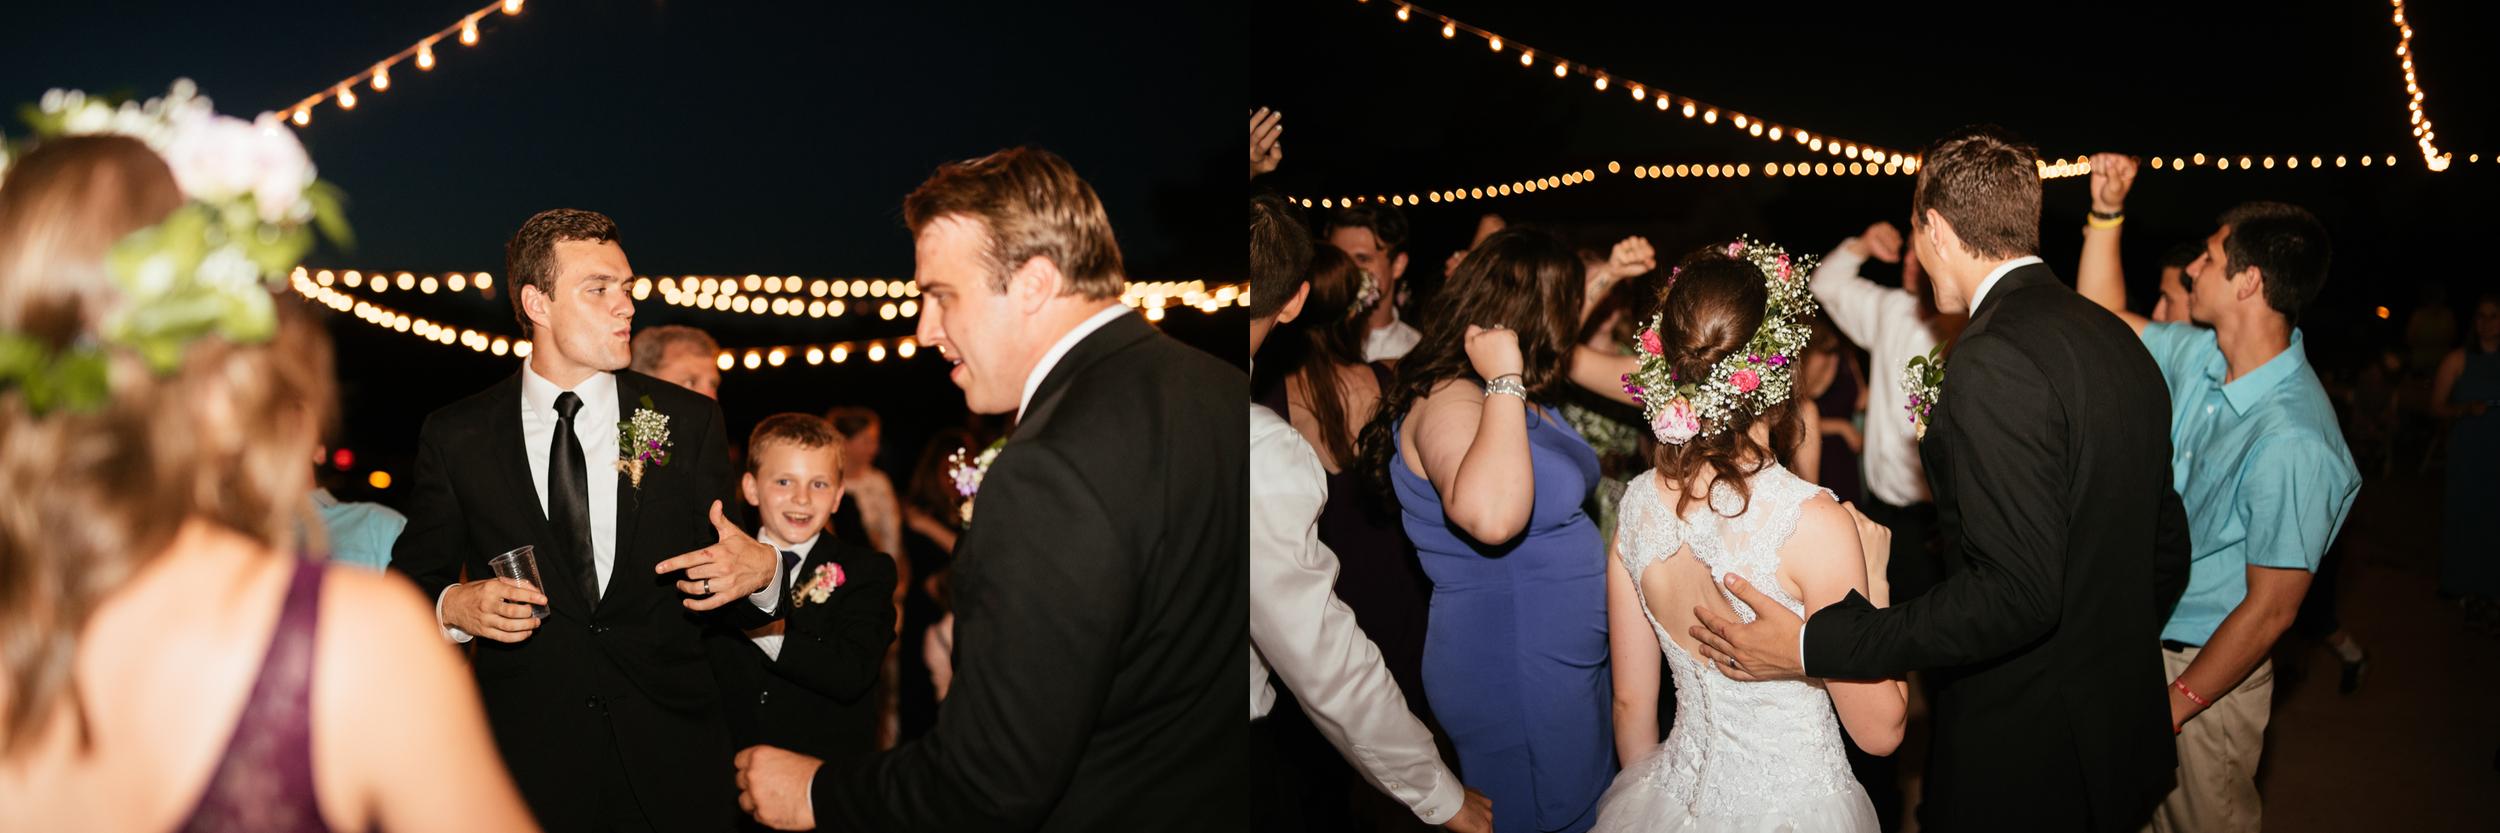 McCurrach Wedding23.jpg